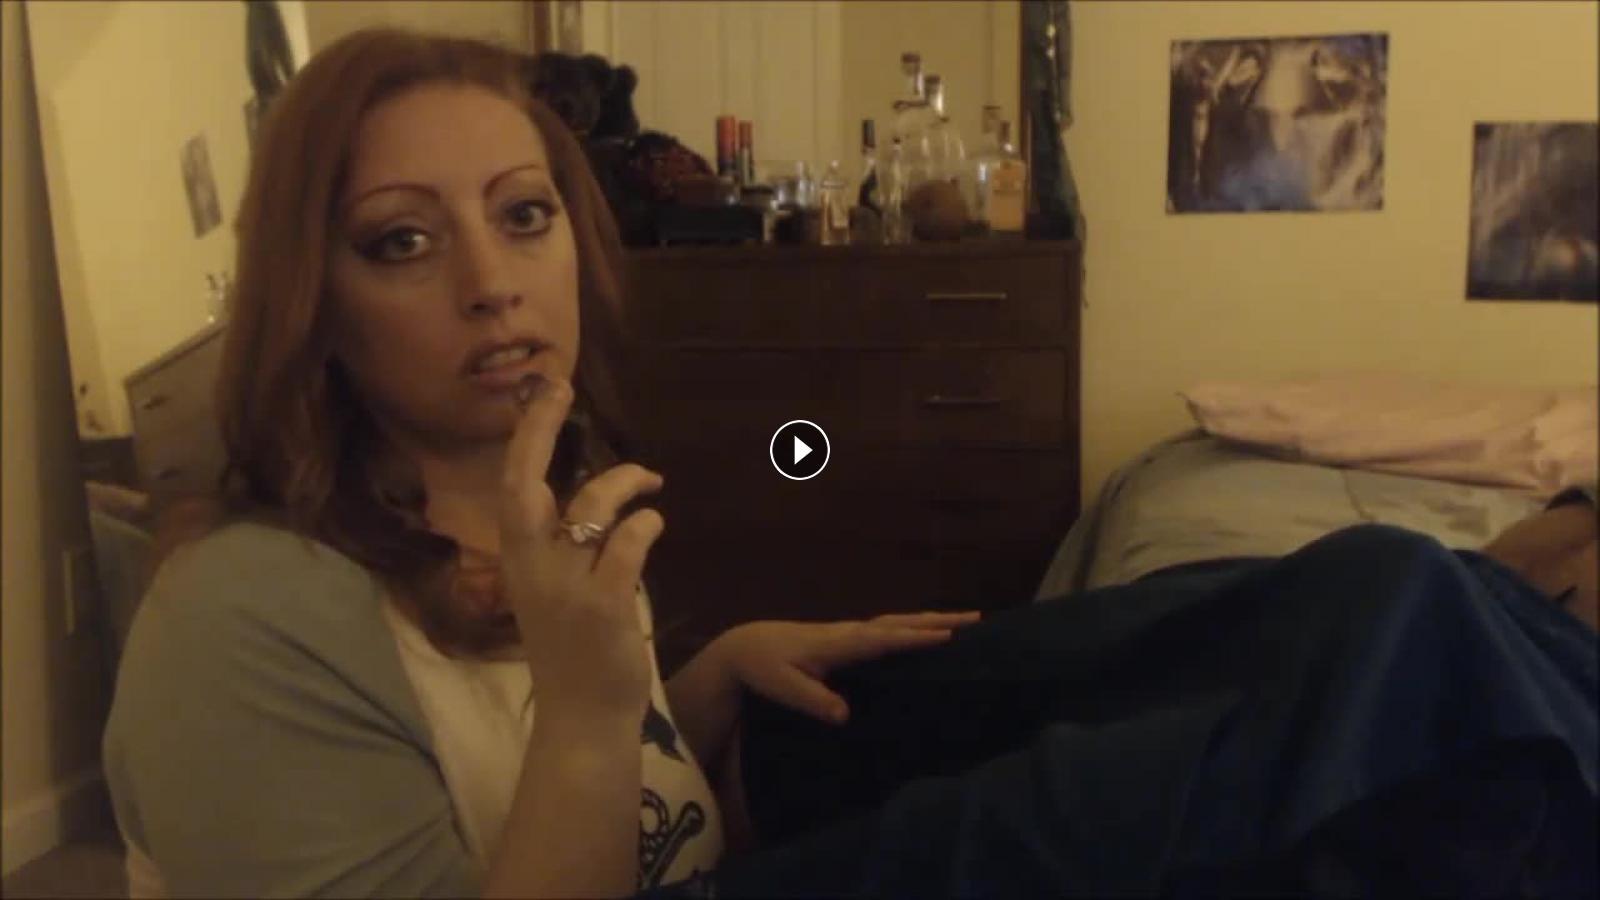 Shemale fucks girl bareback